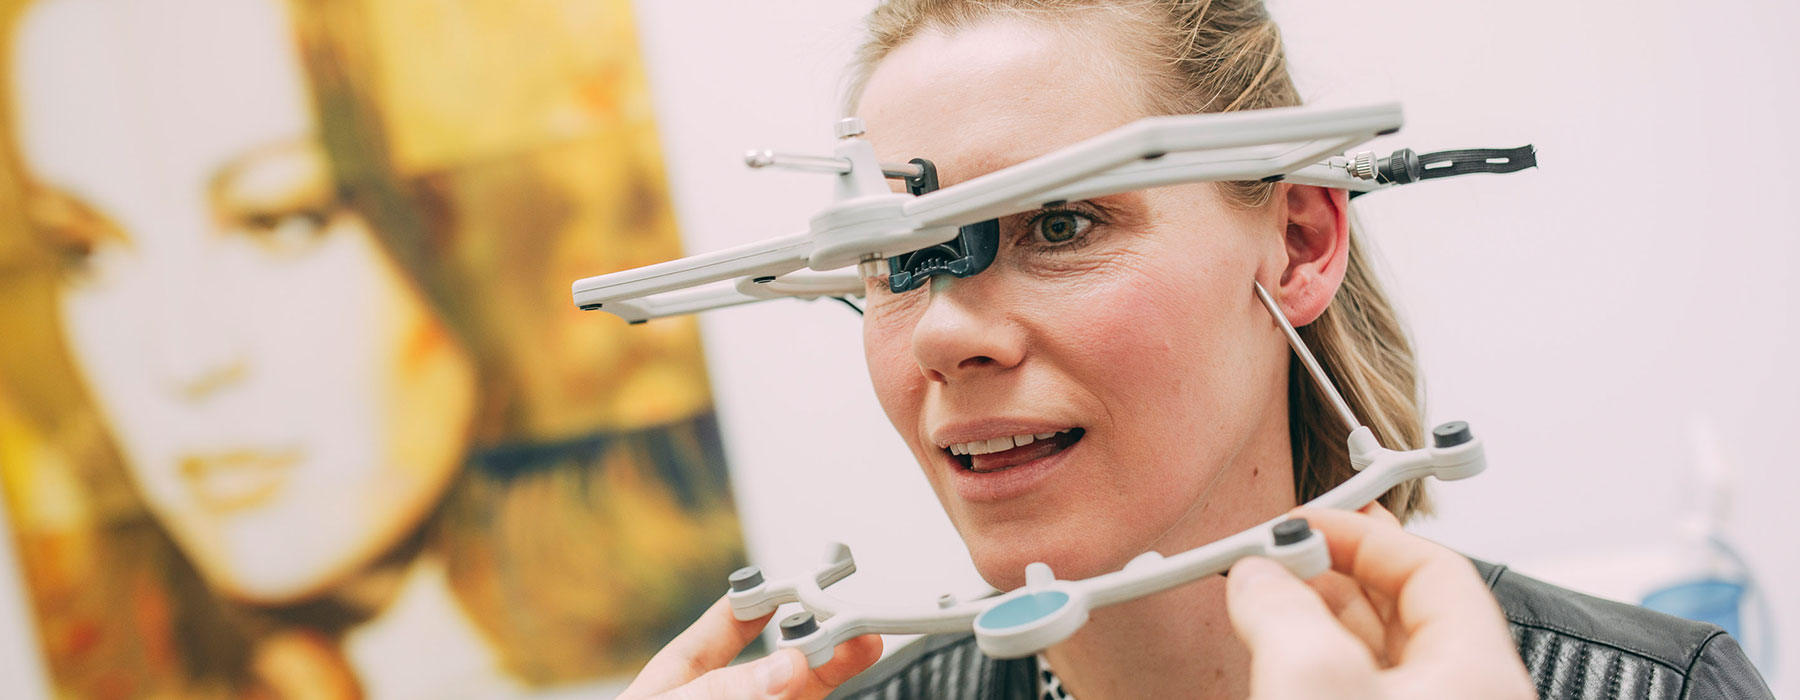 Kieferfunktionsanalyse beim Zahnarzt in Frankfurt